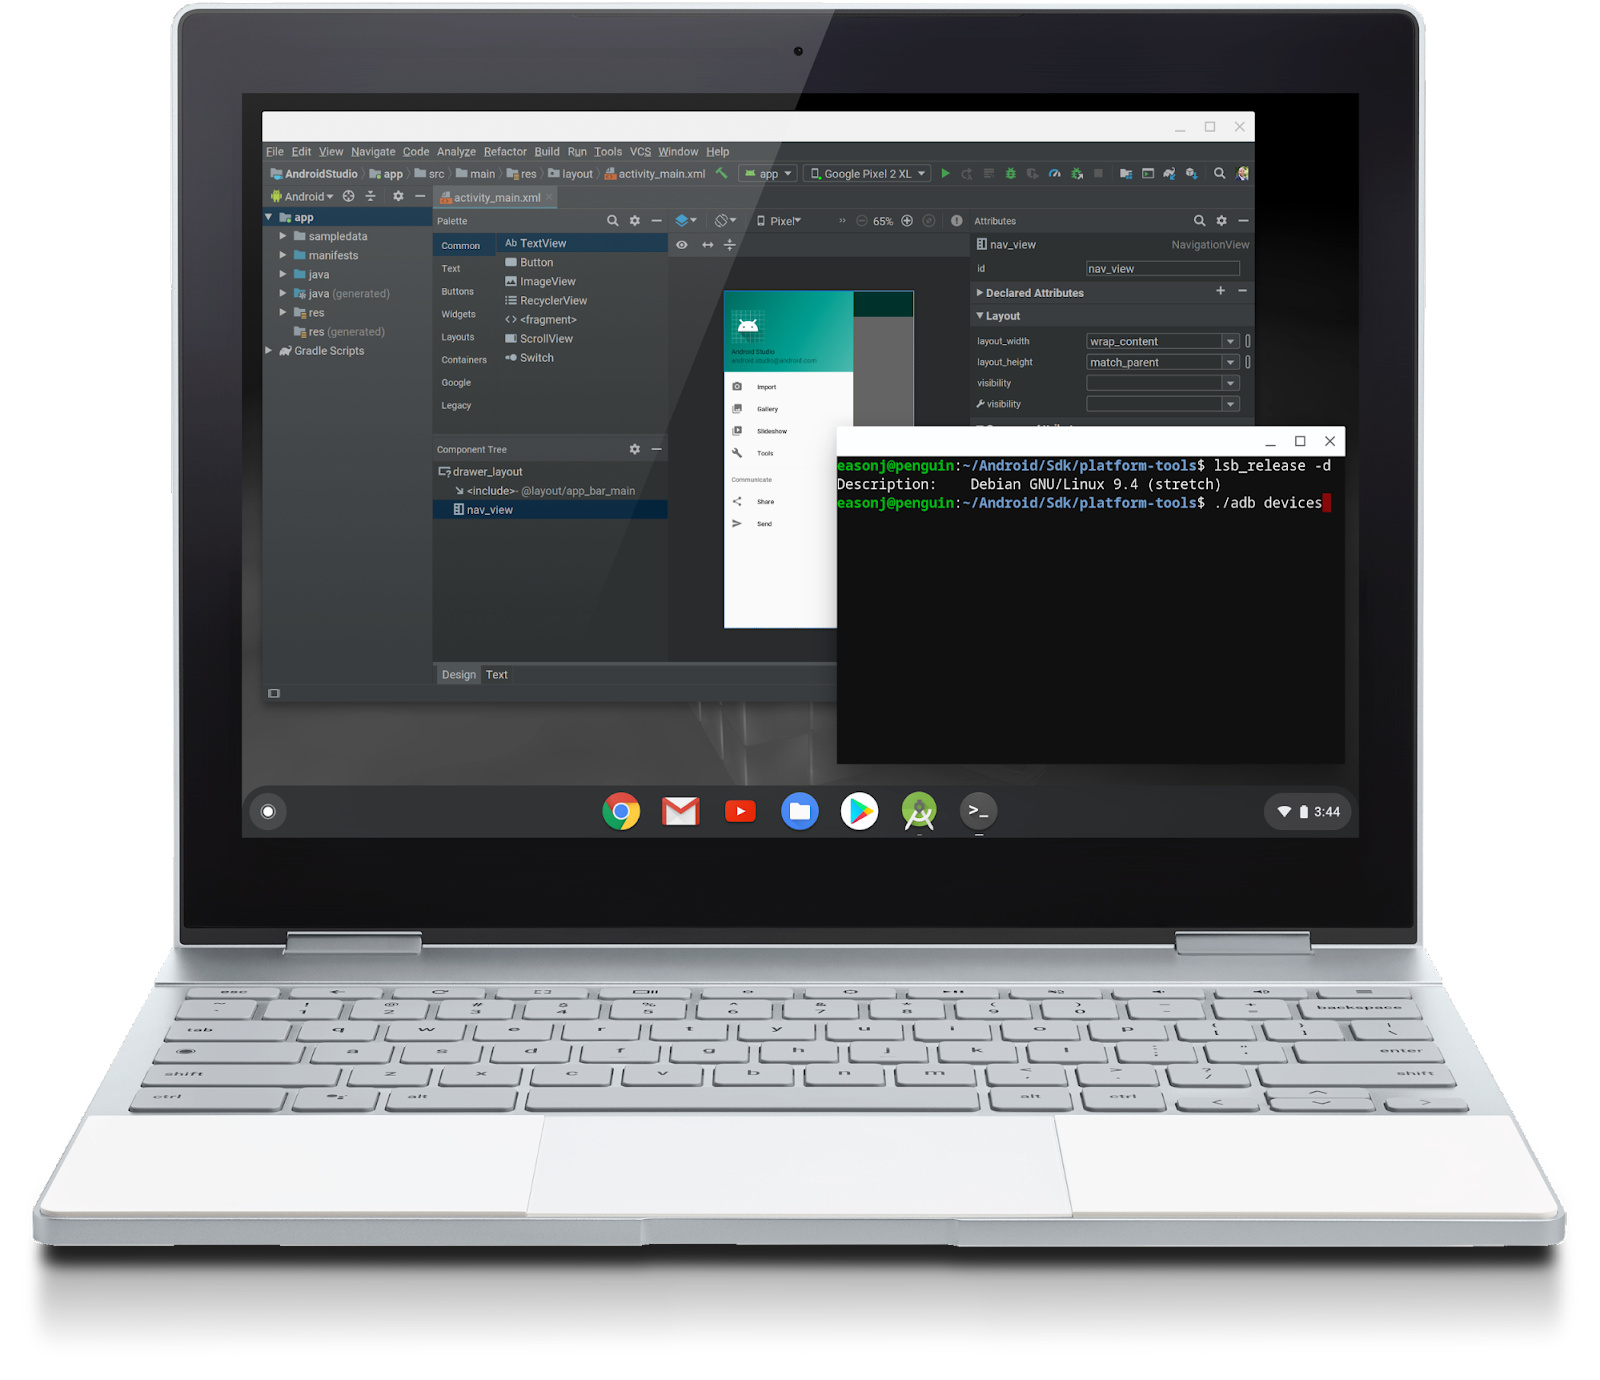 Chrome OSで動作する「Android Studio」